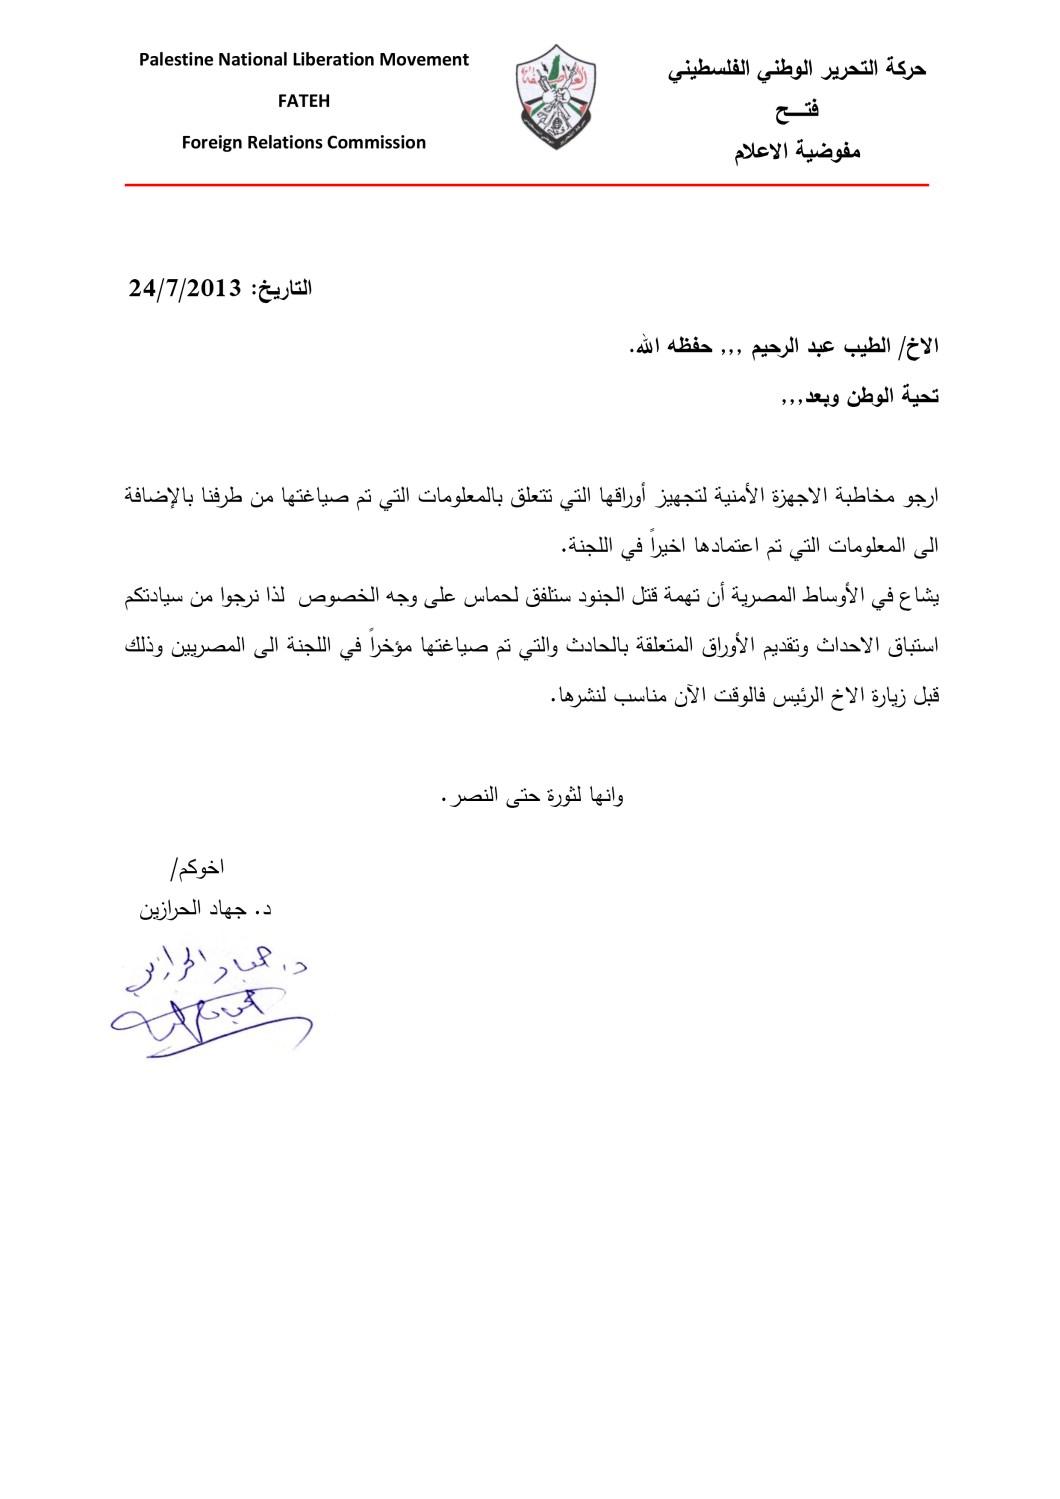 cover letter in arabic physic minimalistics co